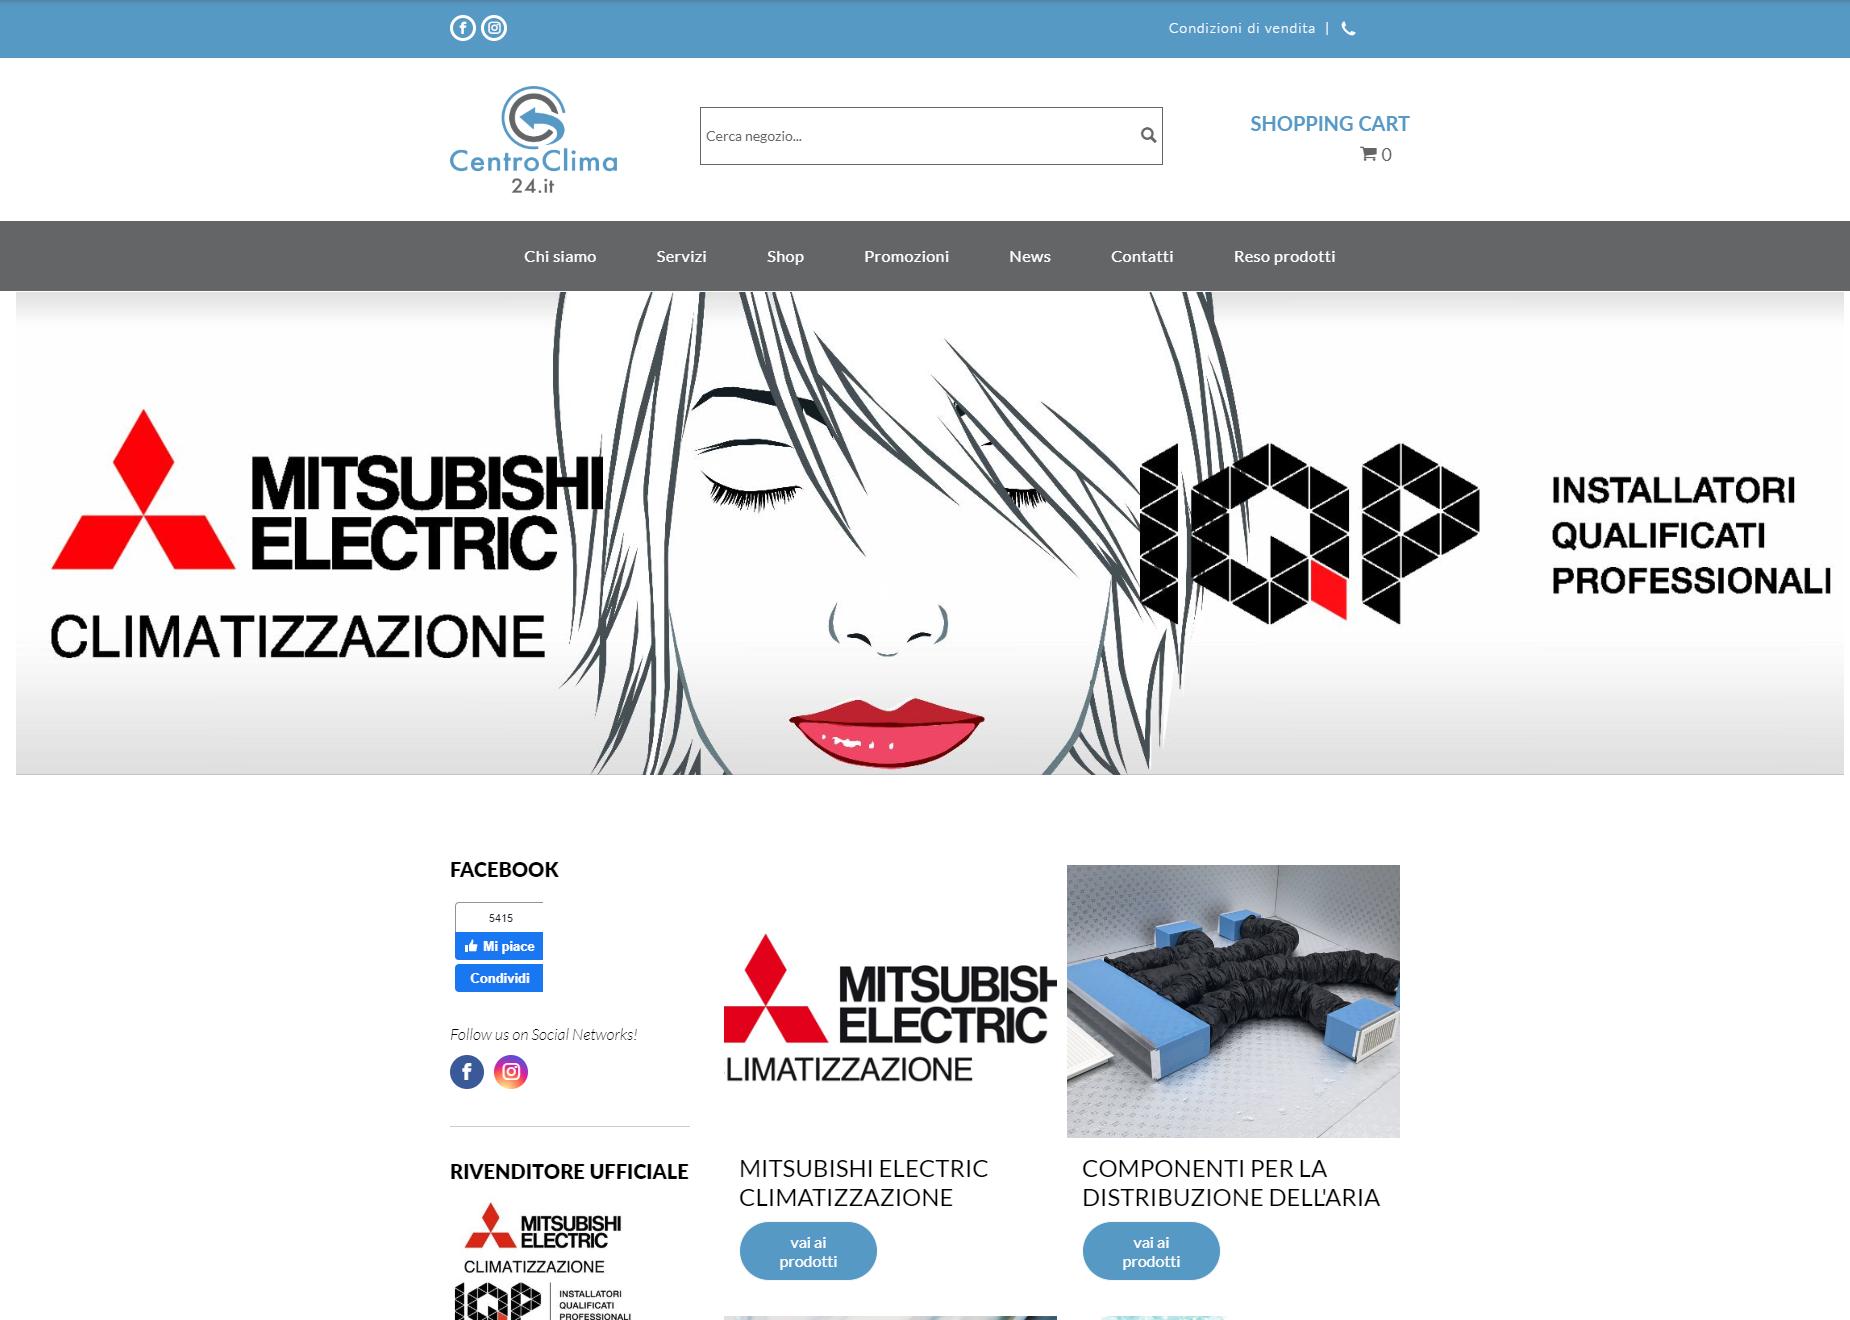 screencapture-editor-it-simplysite-net-home-site-8580c62f-home-2019-12-12-10_53_46(1)